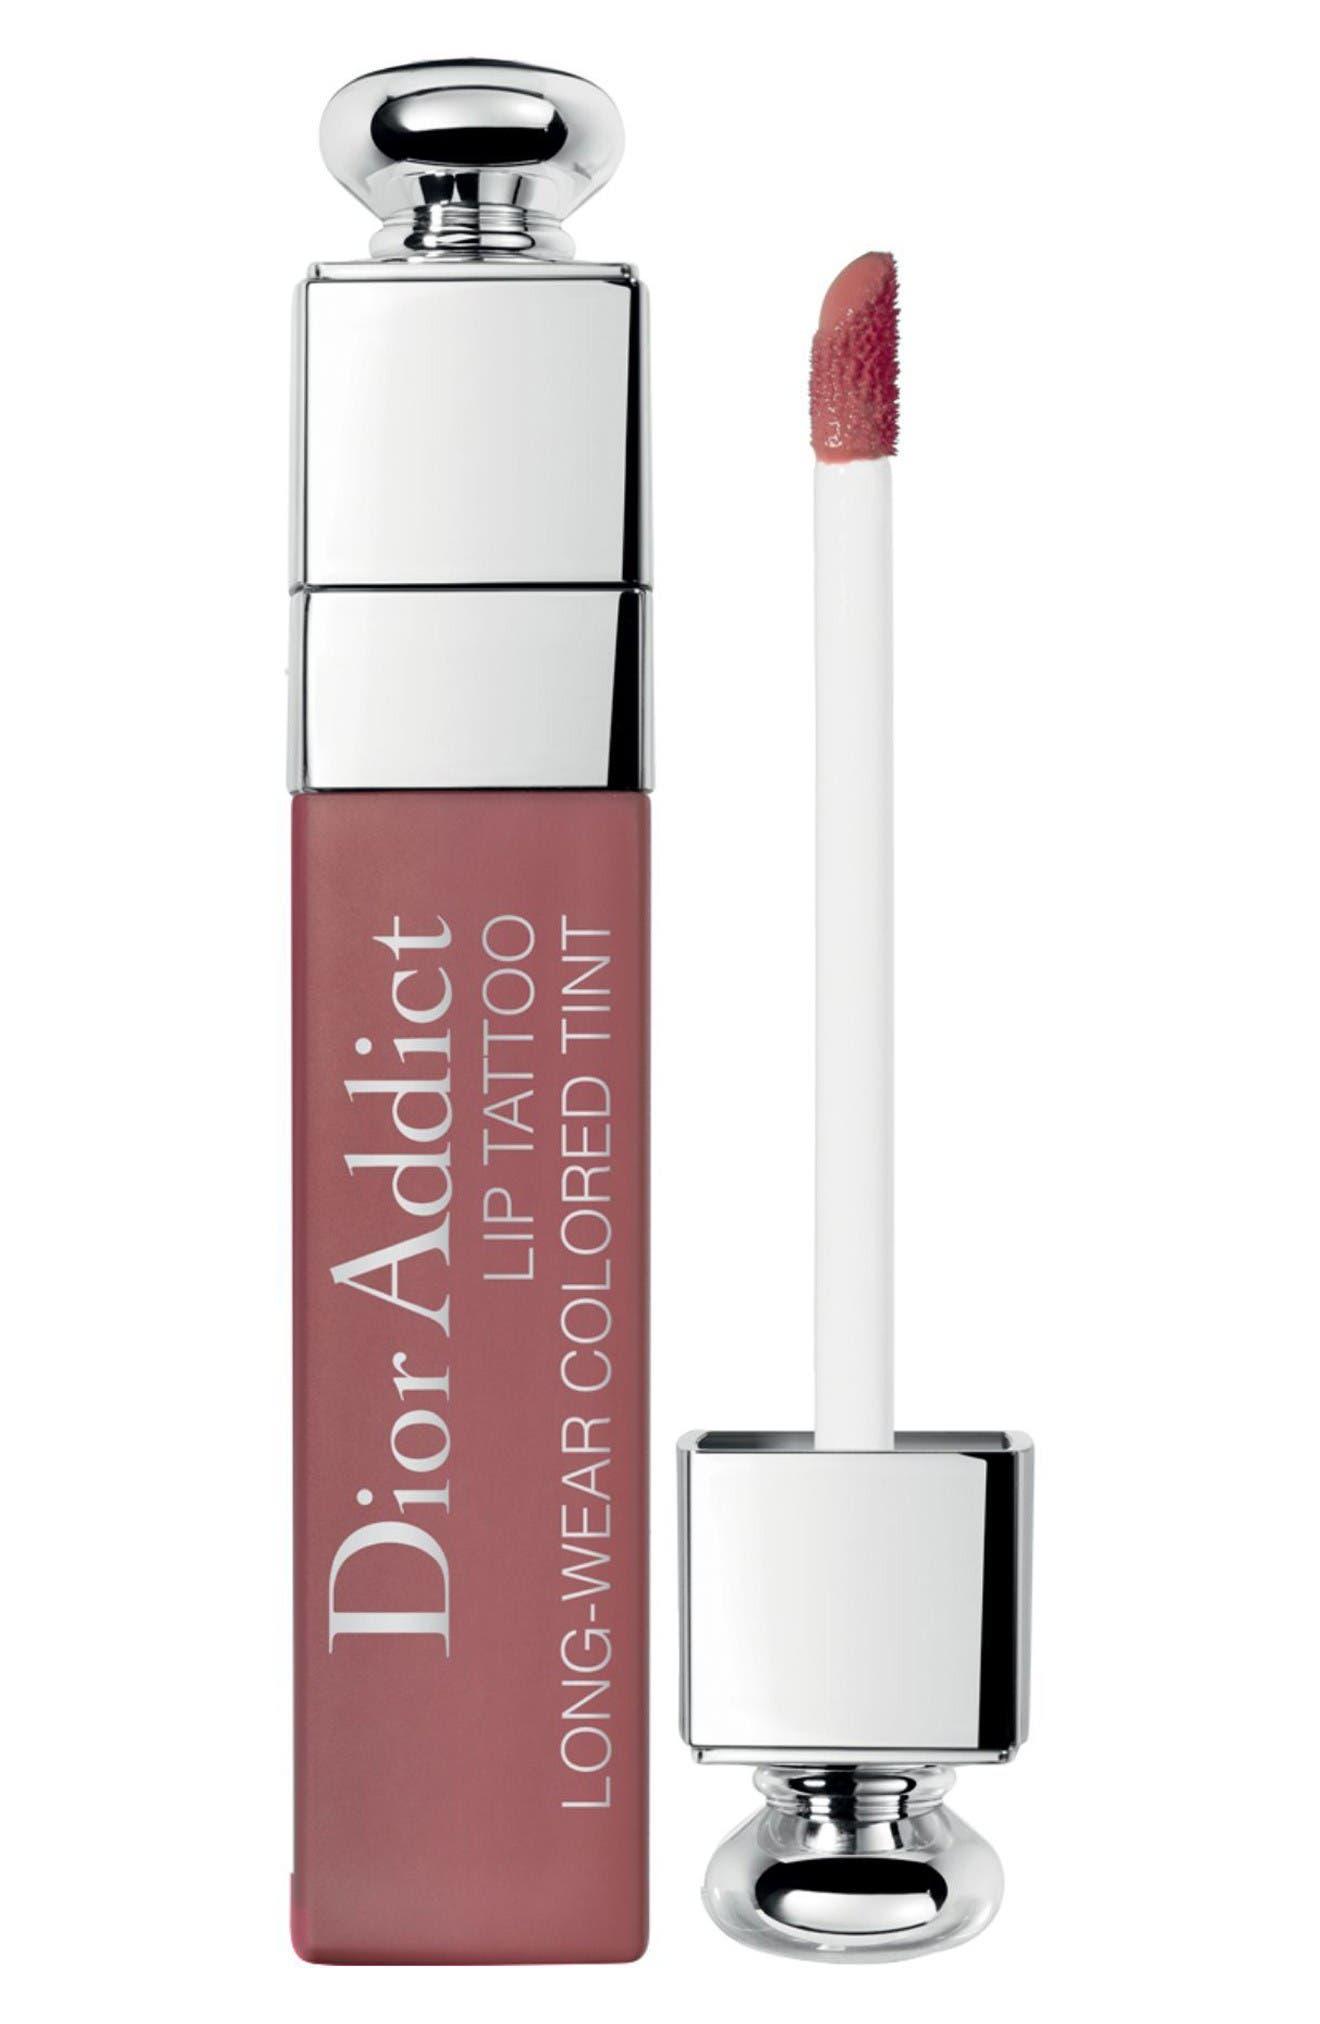 Dior Addict Lip Tattoo Long-Wearing Color Tint